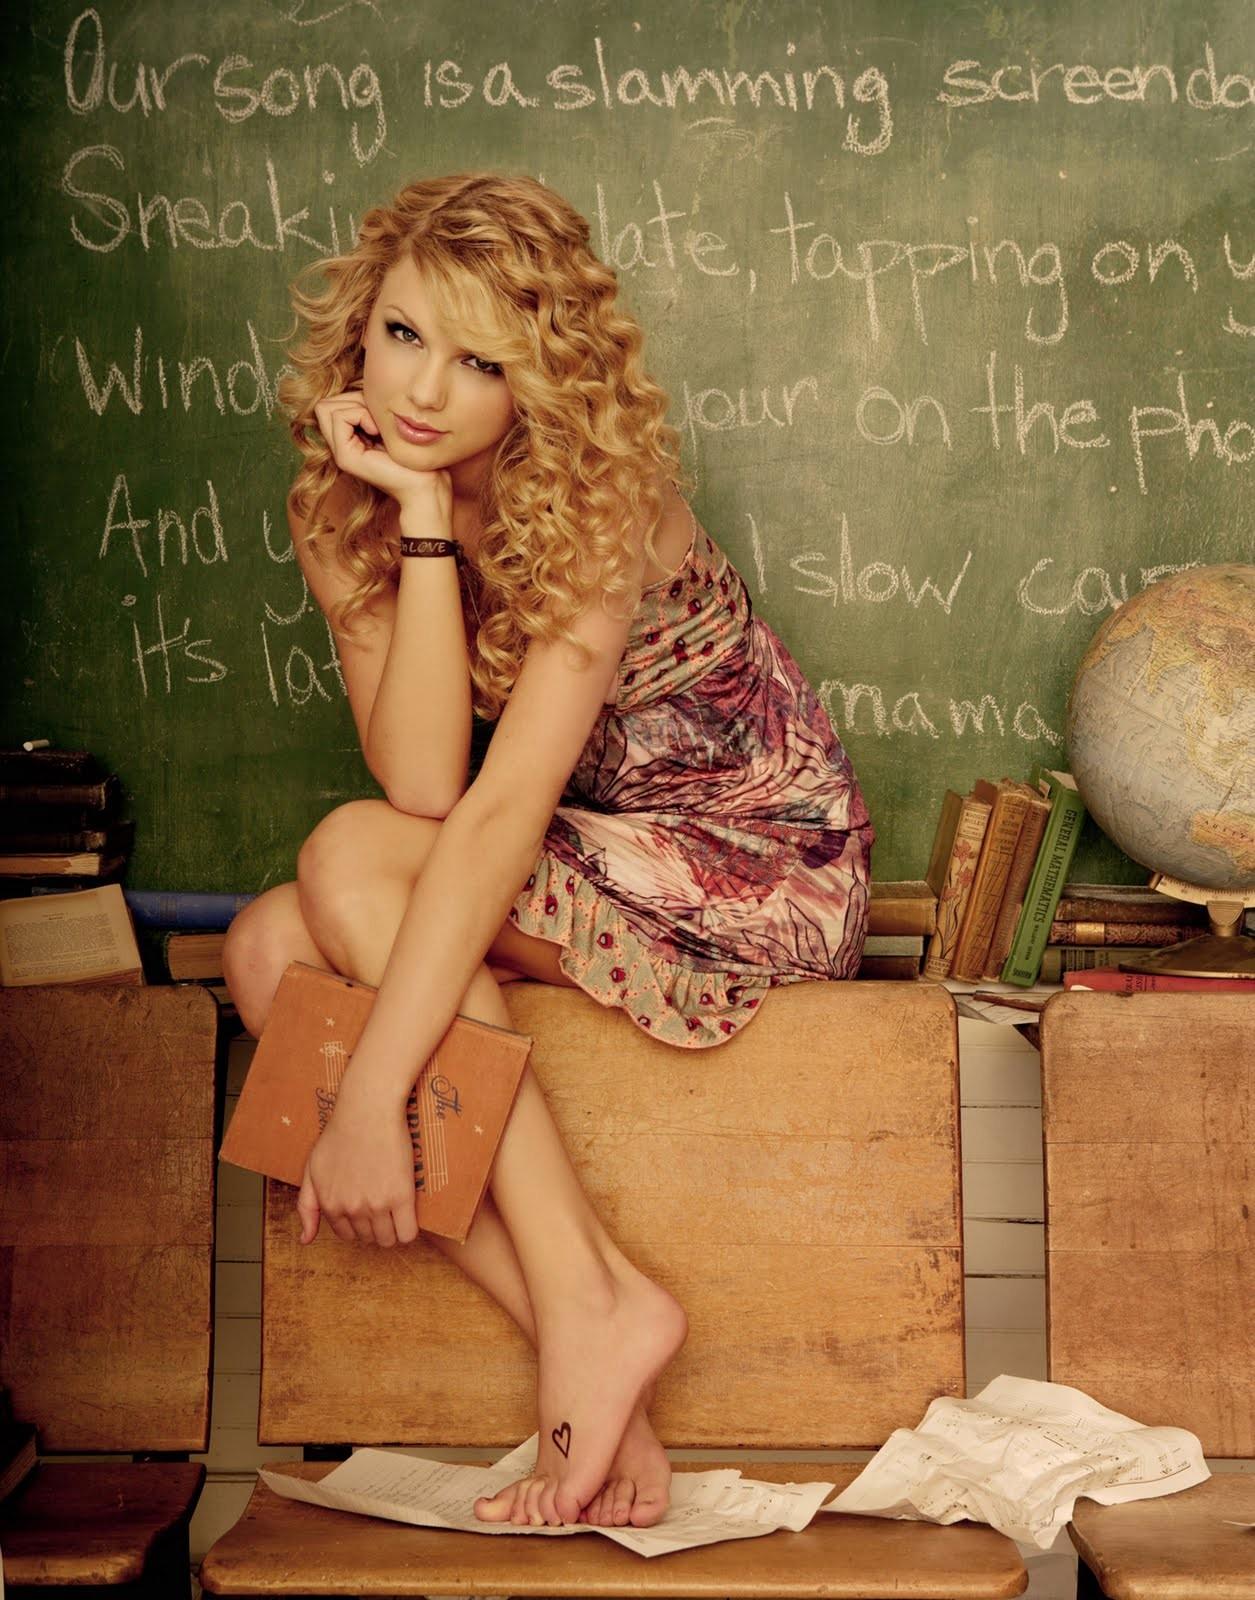 People 1255x1600 women blonde long hair looking at viewer singer Taylor Swift musician barefoot curly hair blackboard books globe chalk sitting bare shoulders text school